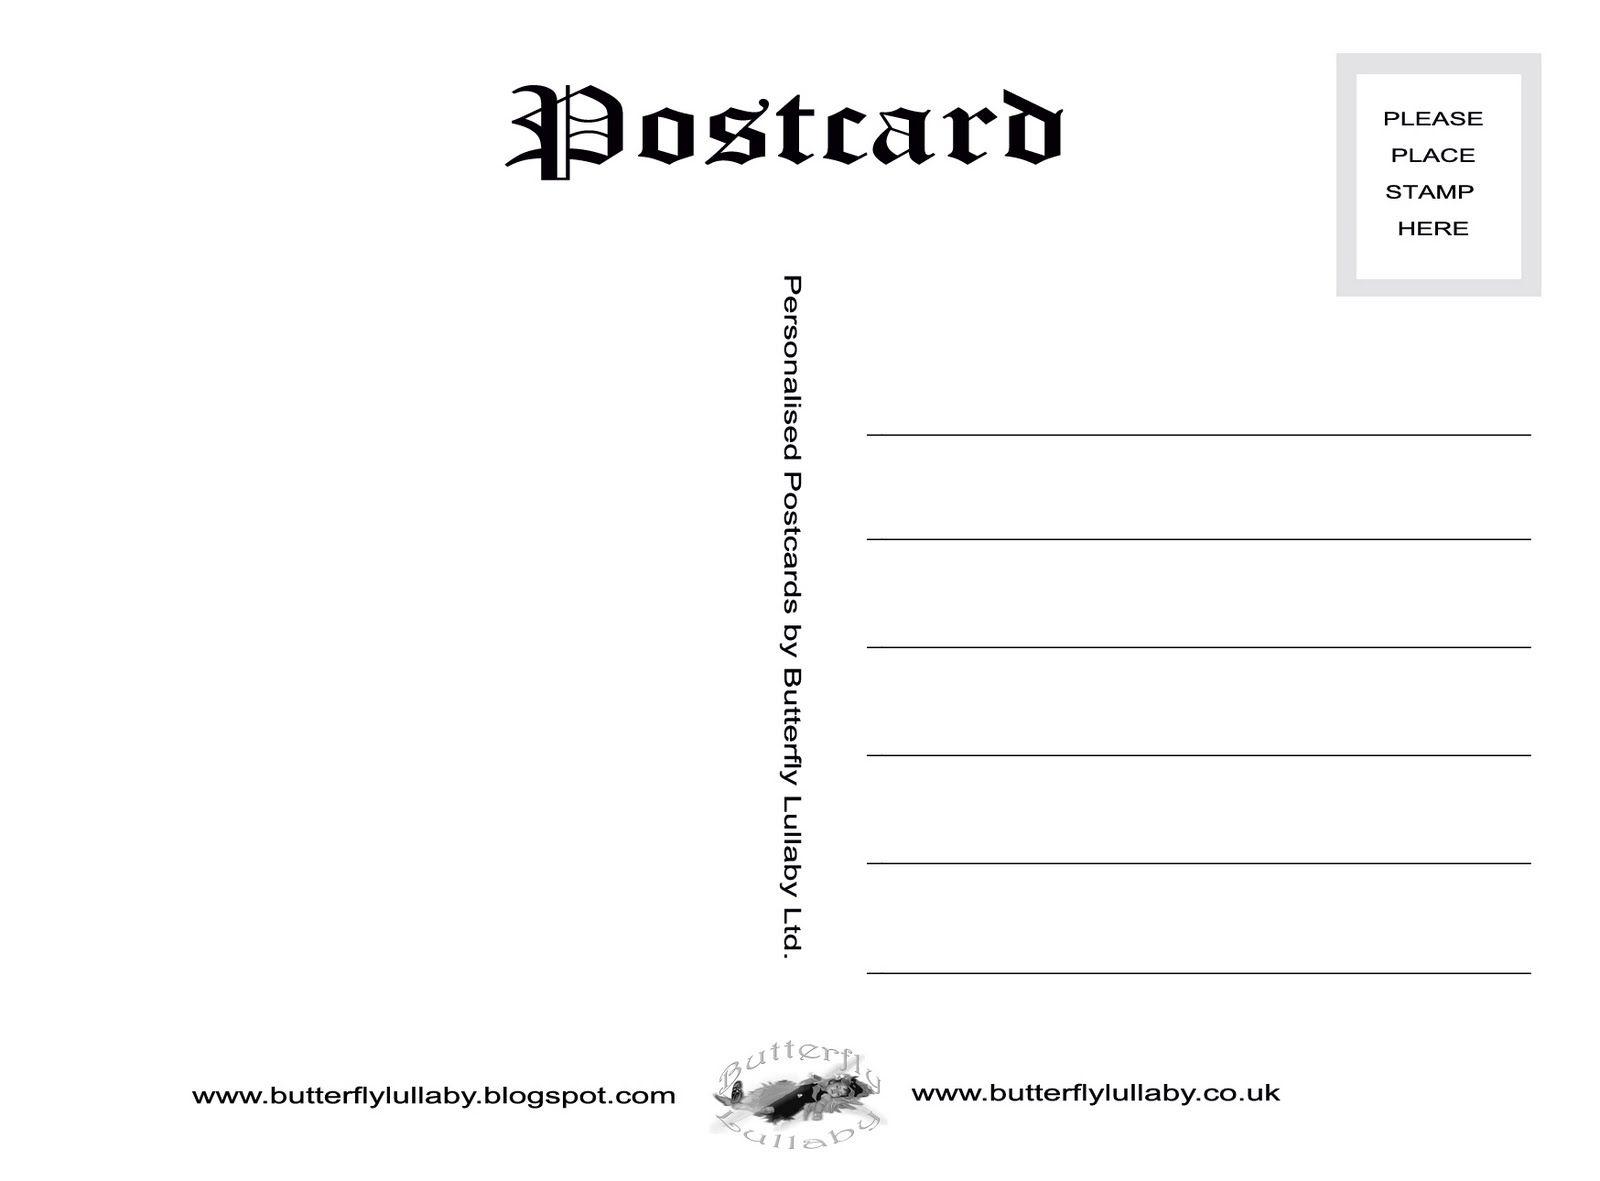 4 x 6 postcard template